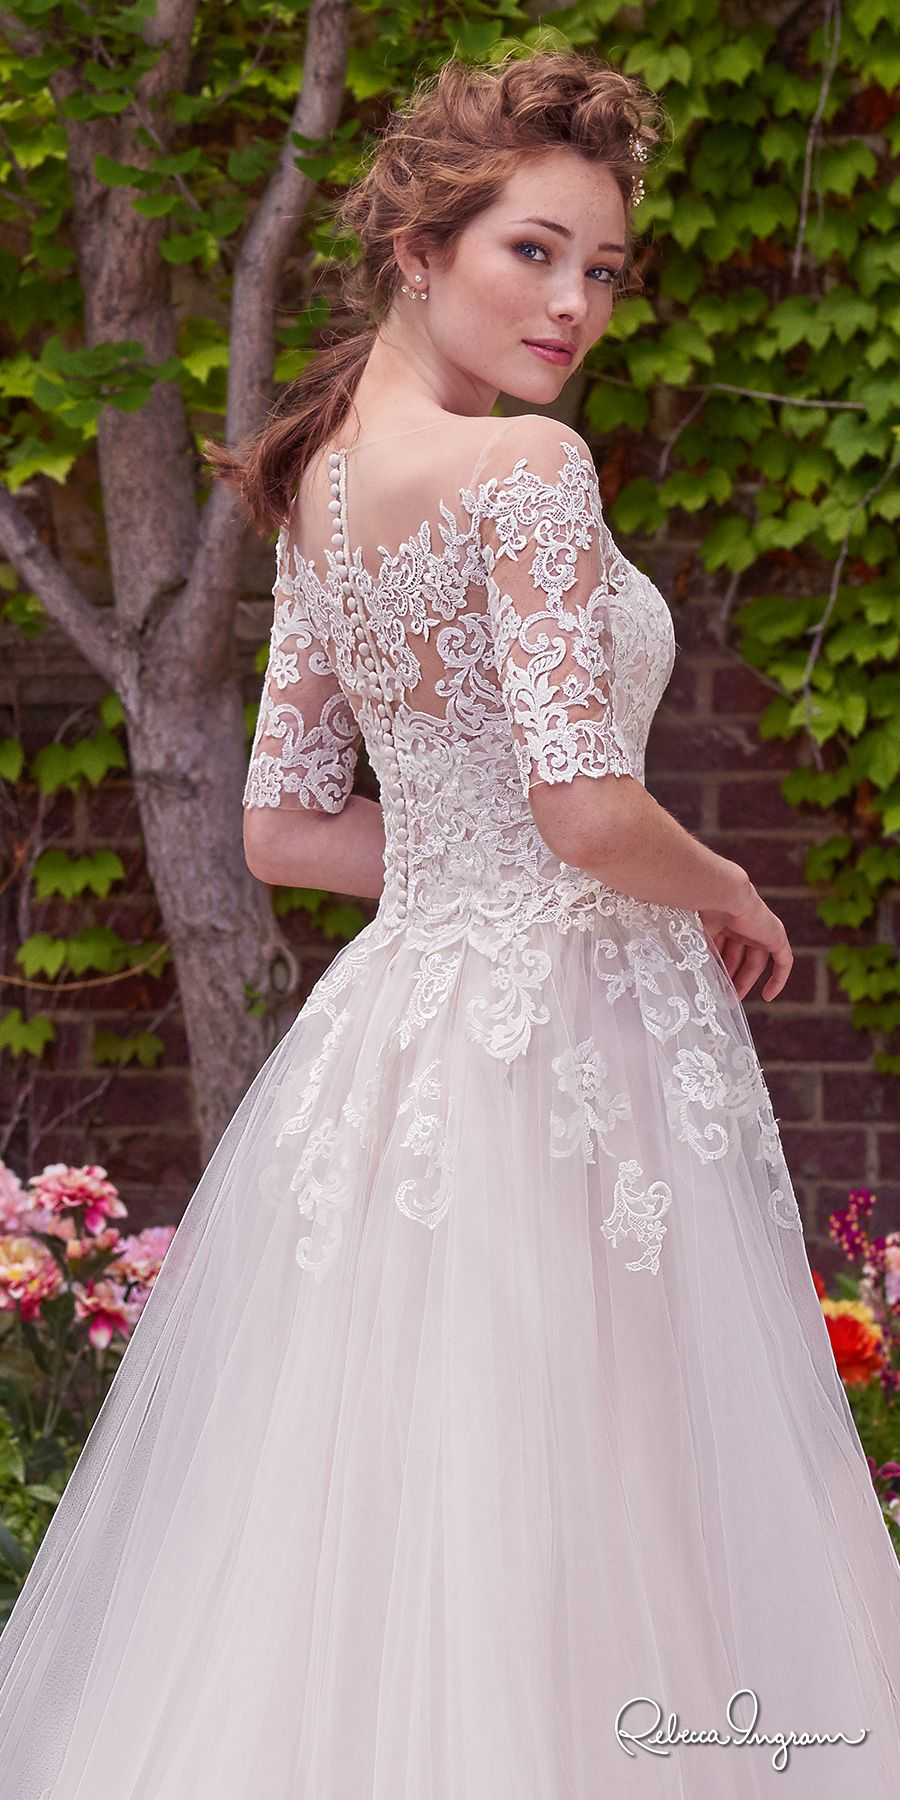 e1dde42f29fc rebecca ingram 2017 bridal half sleeves illusion jewel straight across  neckline heavily embellished bodice romantic princess ball gown a line  wedding dress ...